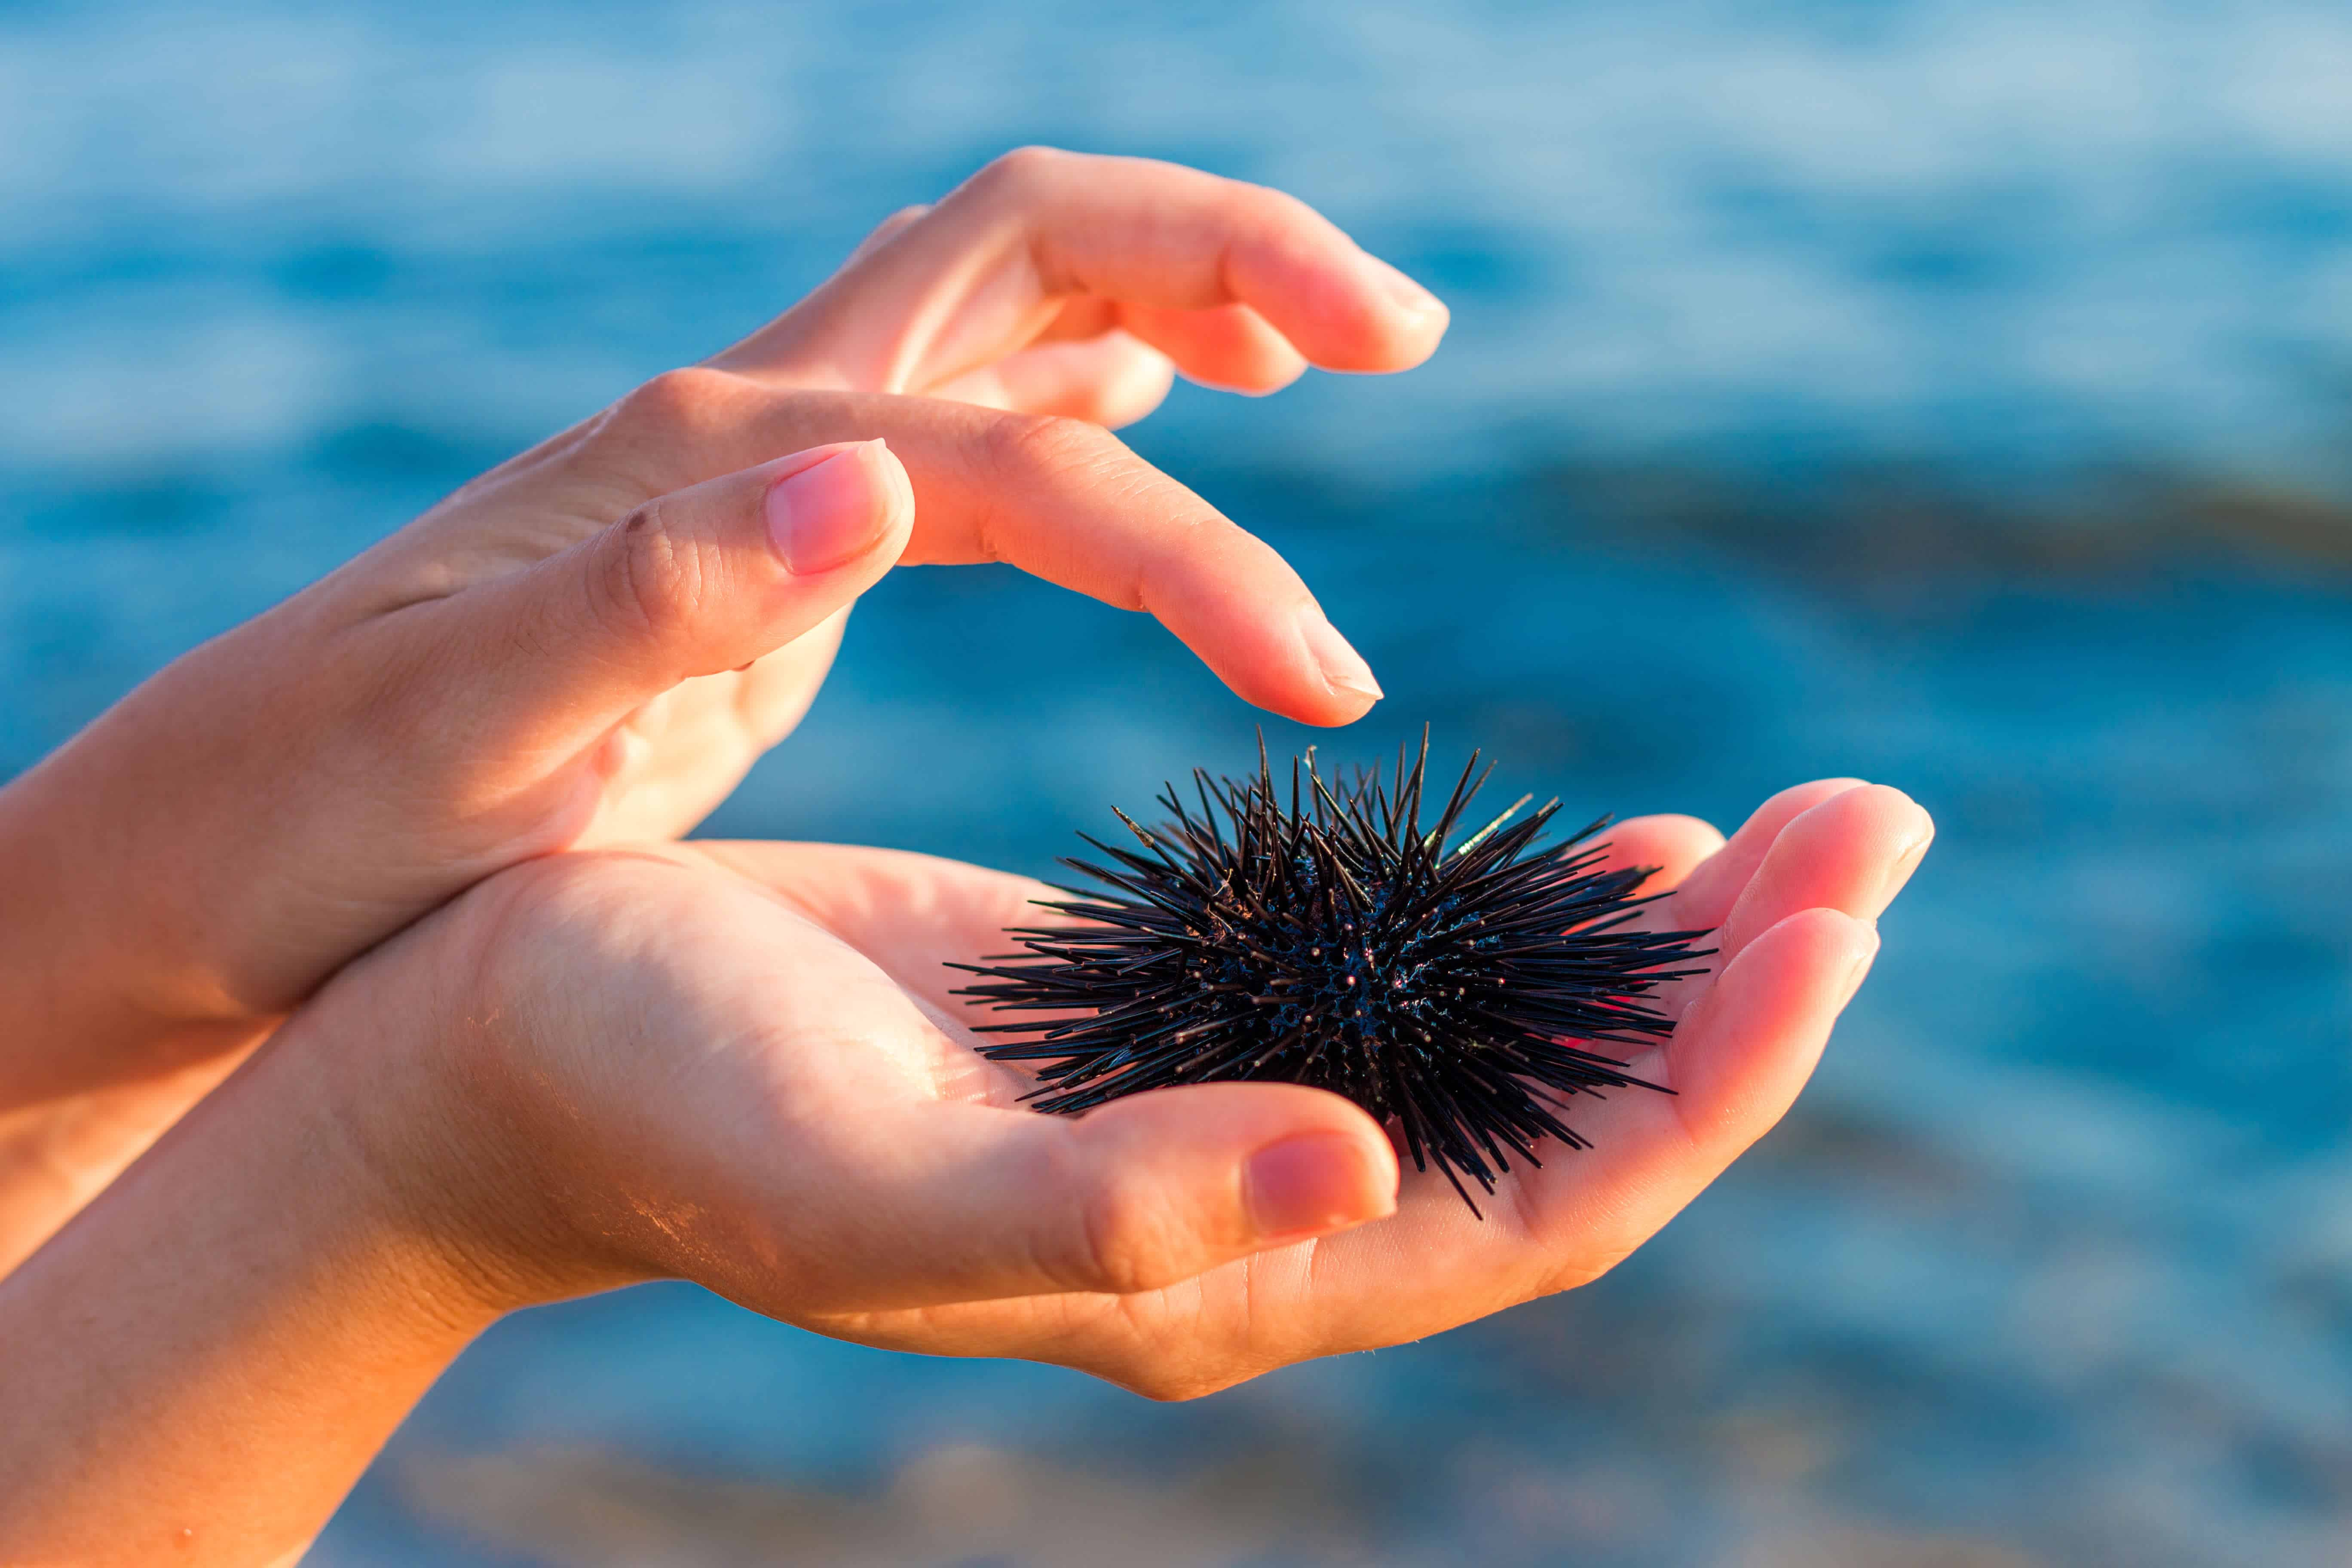 Sea urchin in woman's hand. Stock Photo